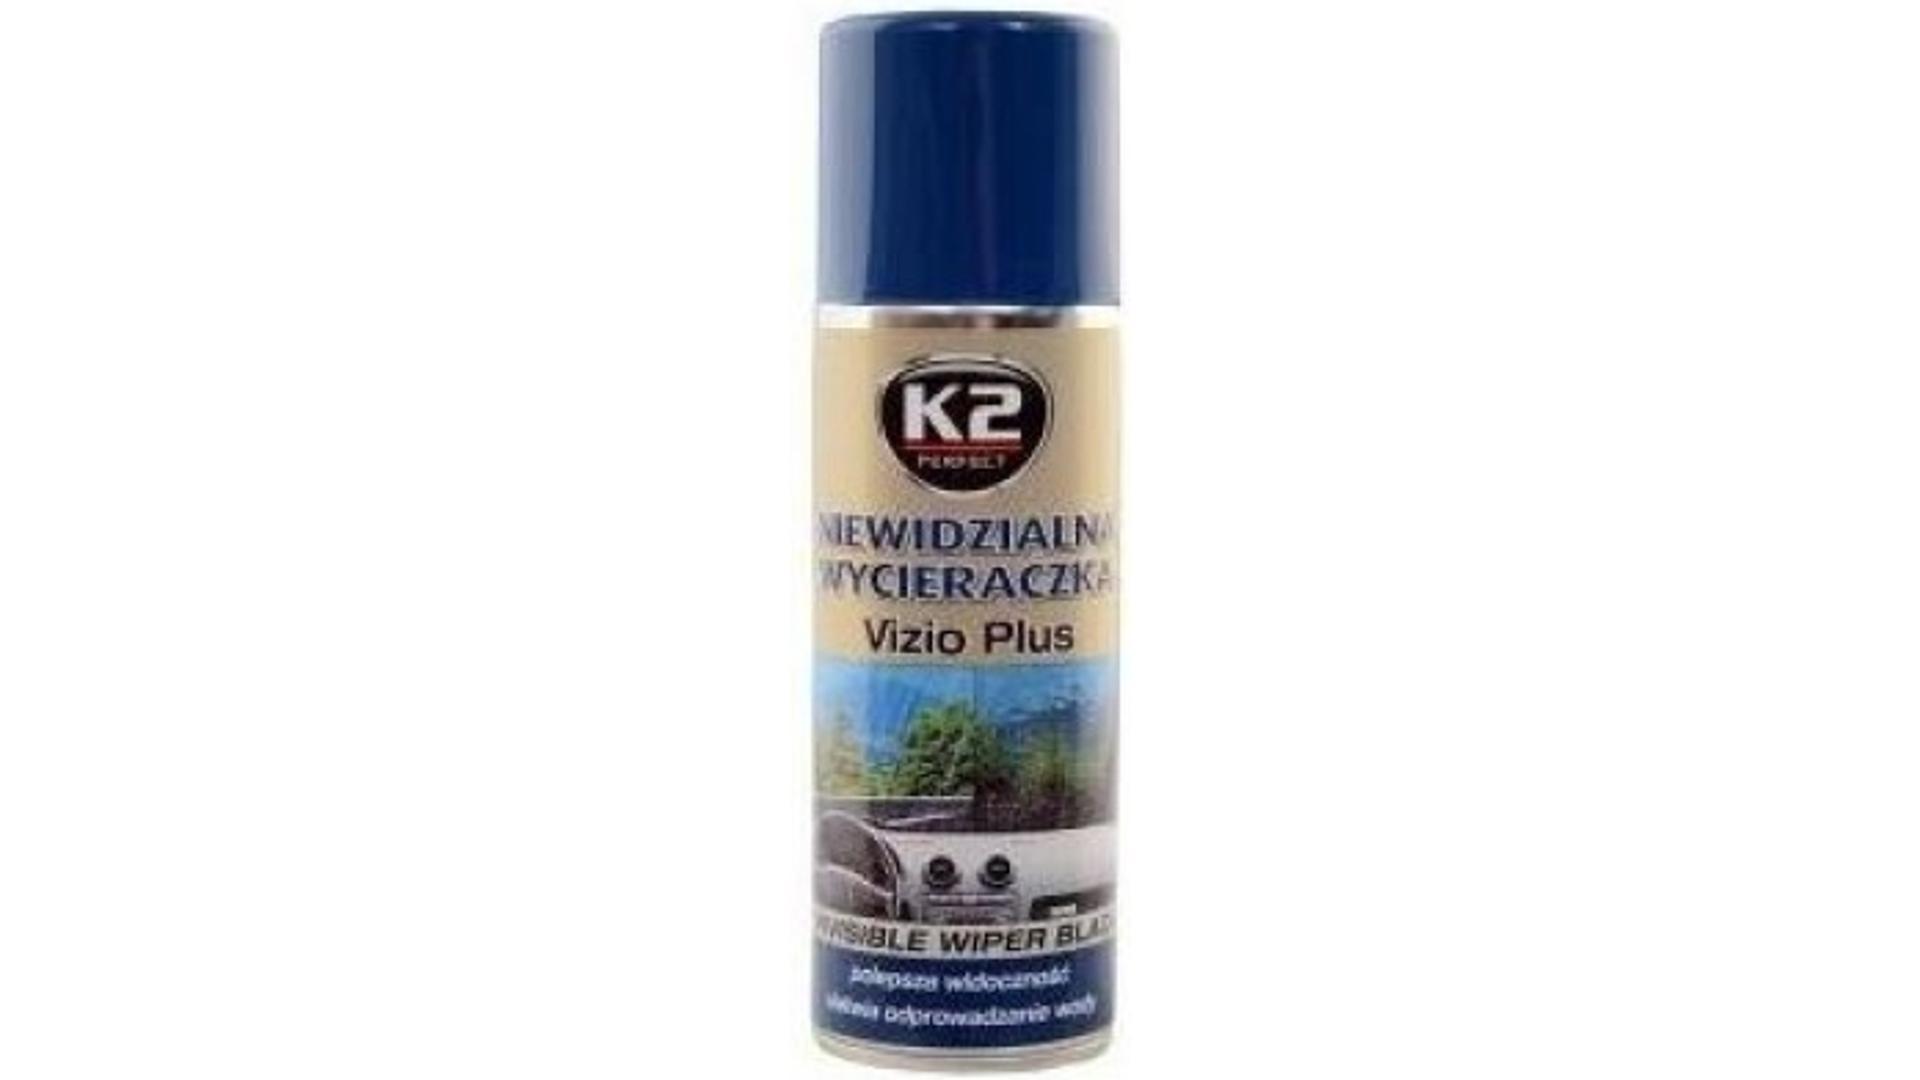 K2 Ochrana celneho skla proti dazdu Vizio 200 Plyn - sprej